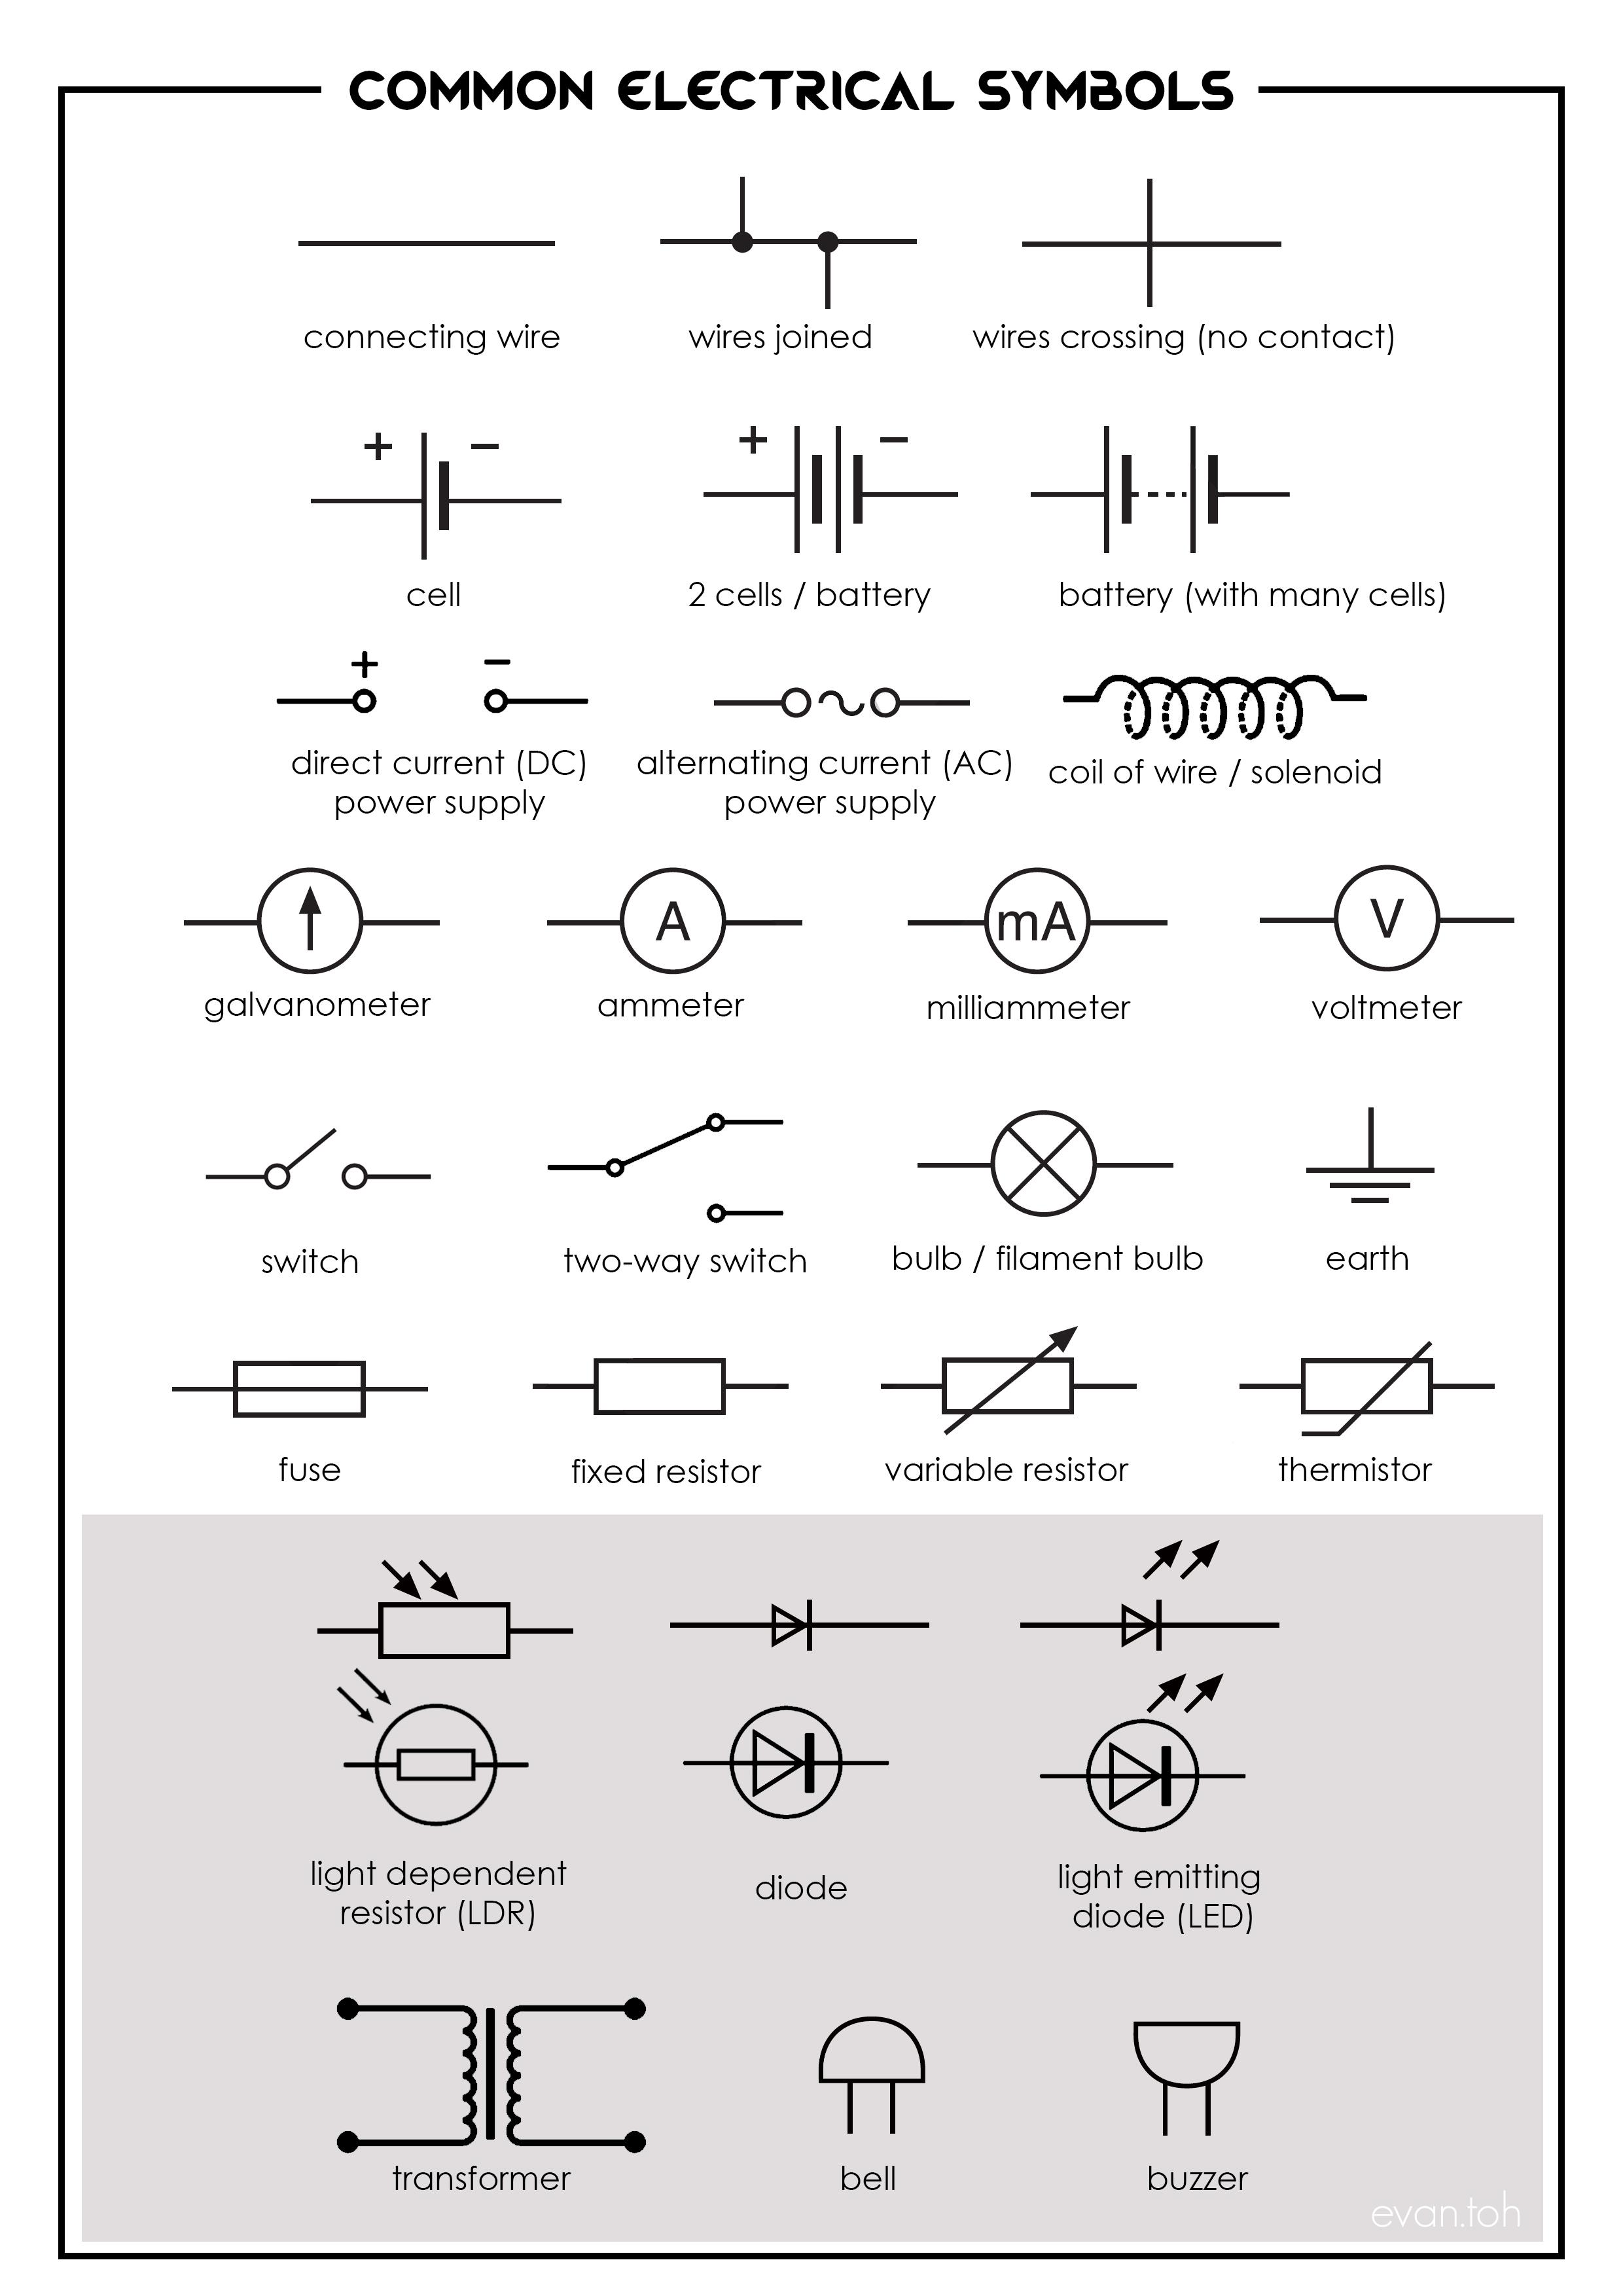 small resolution of common electrical symbols evan u0027s spacedc wiring symbols 4